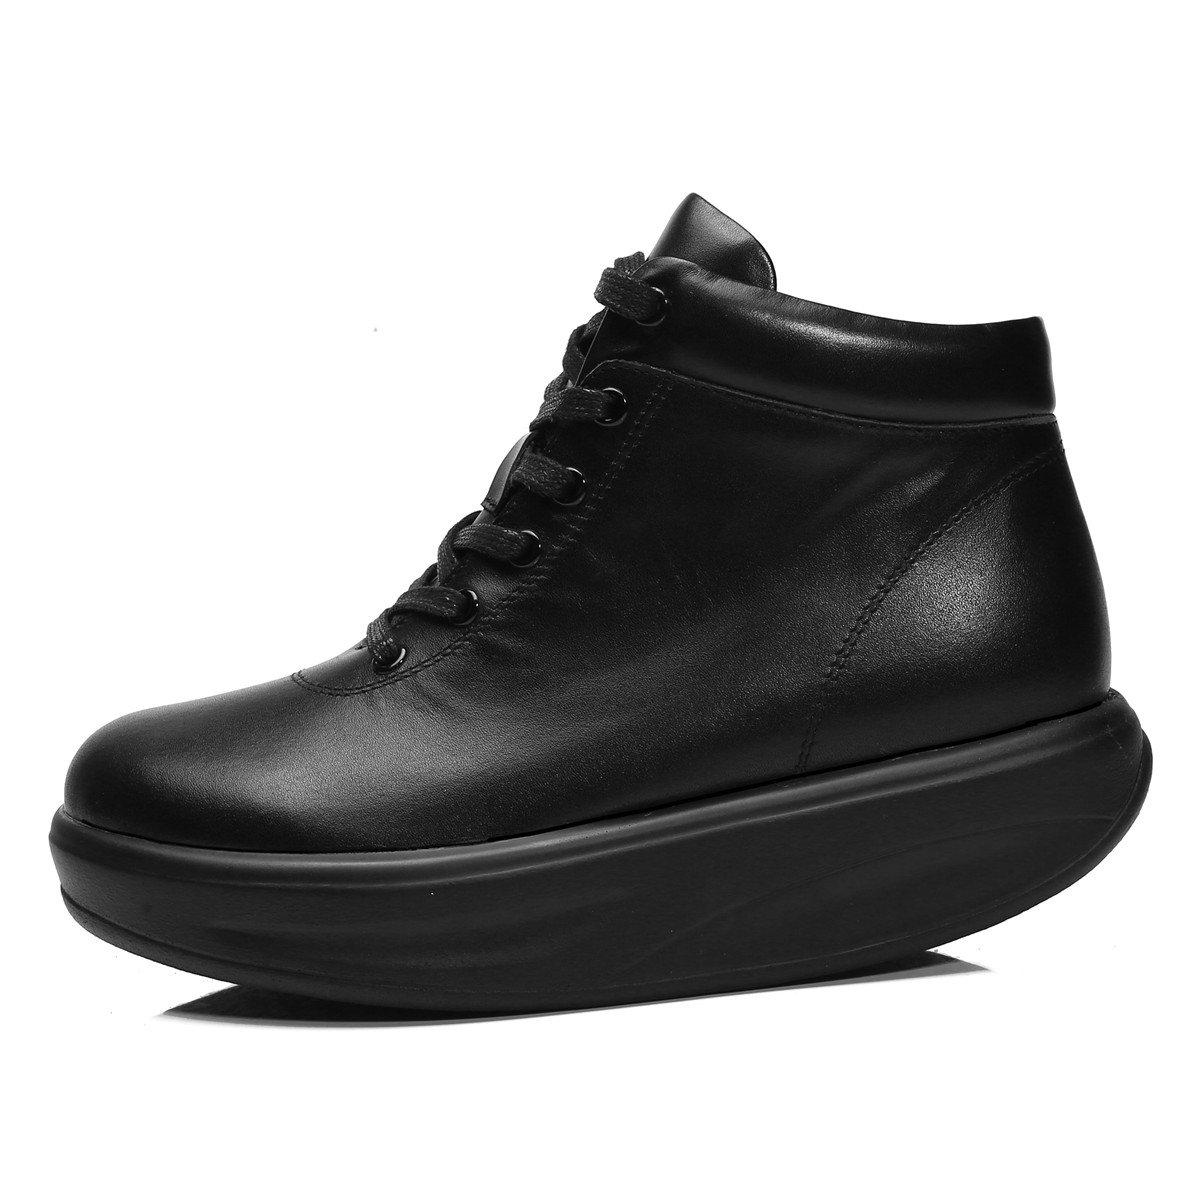 RoseG Women's Sneakers Leather Lace up Platform Sneakers Women's Ankle Boots B079FVXSPB 9 B(M) US|Black 16538c